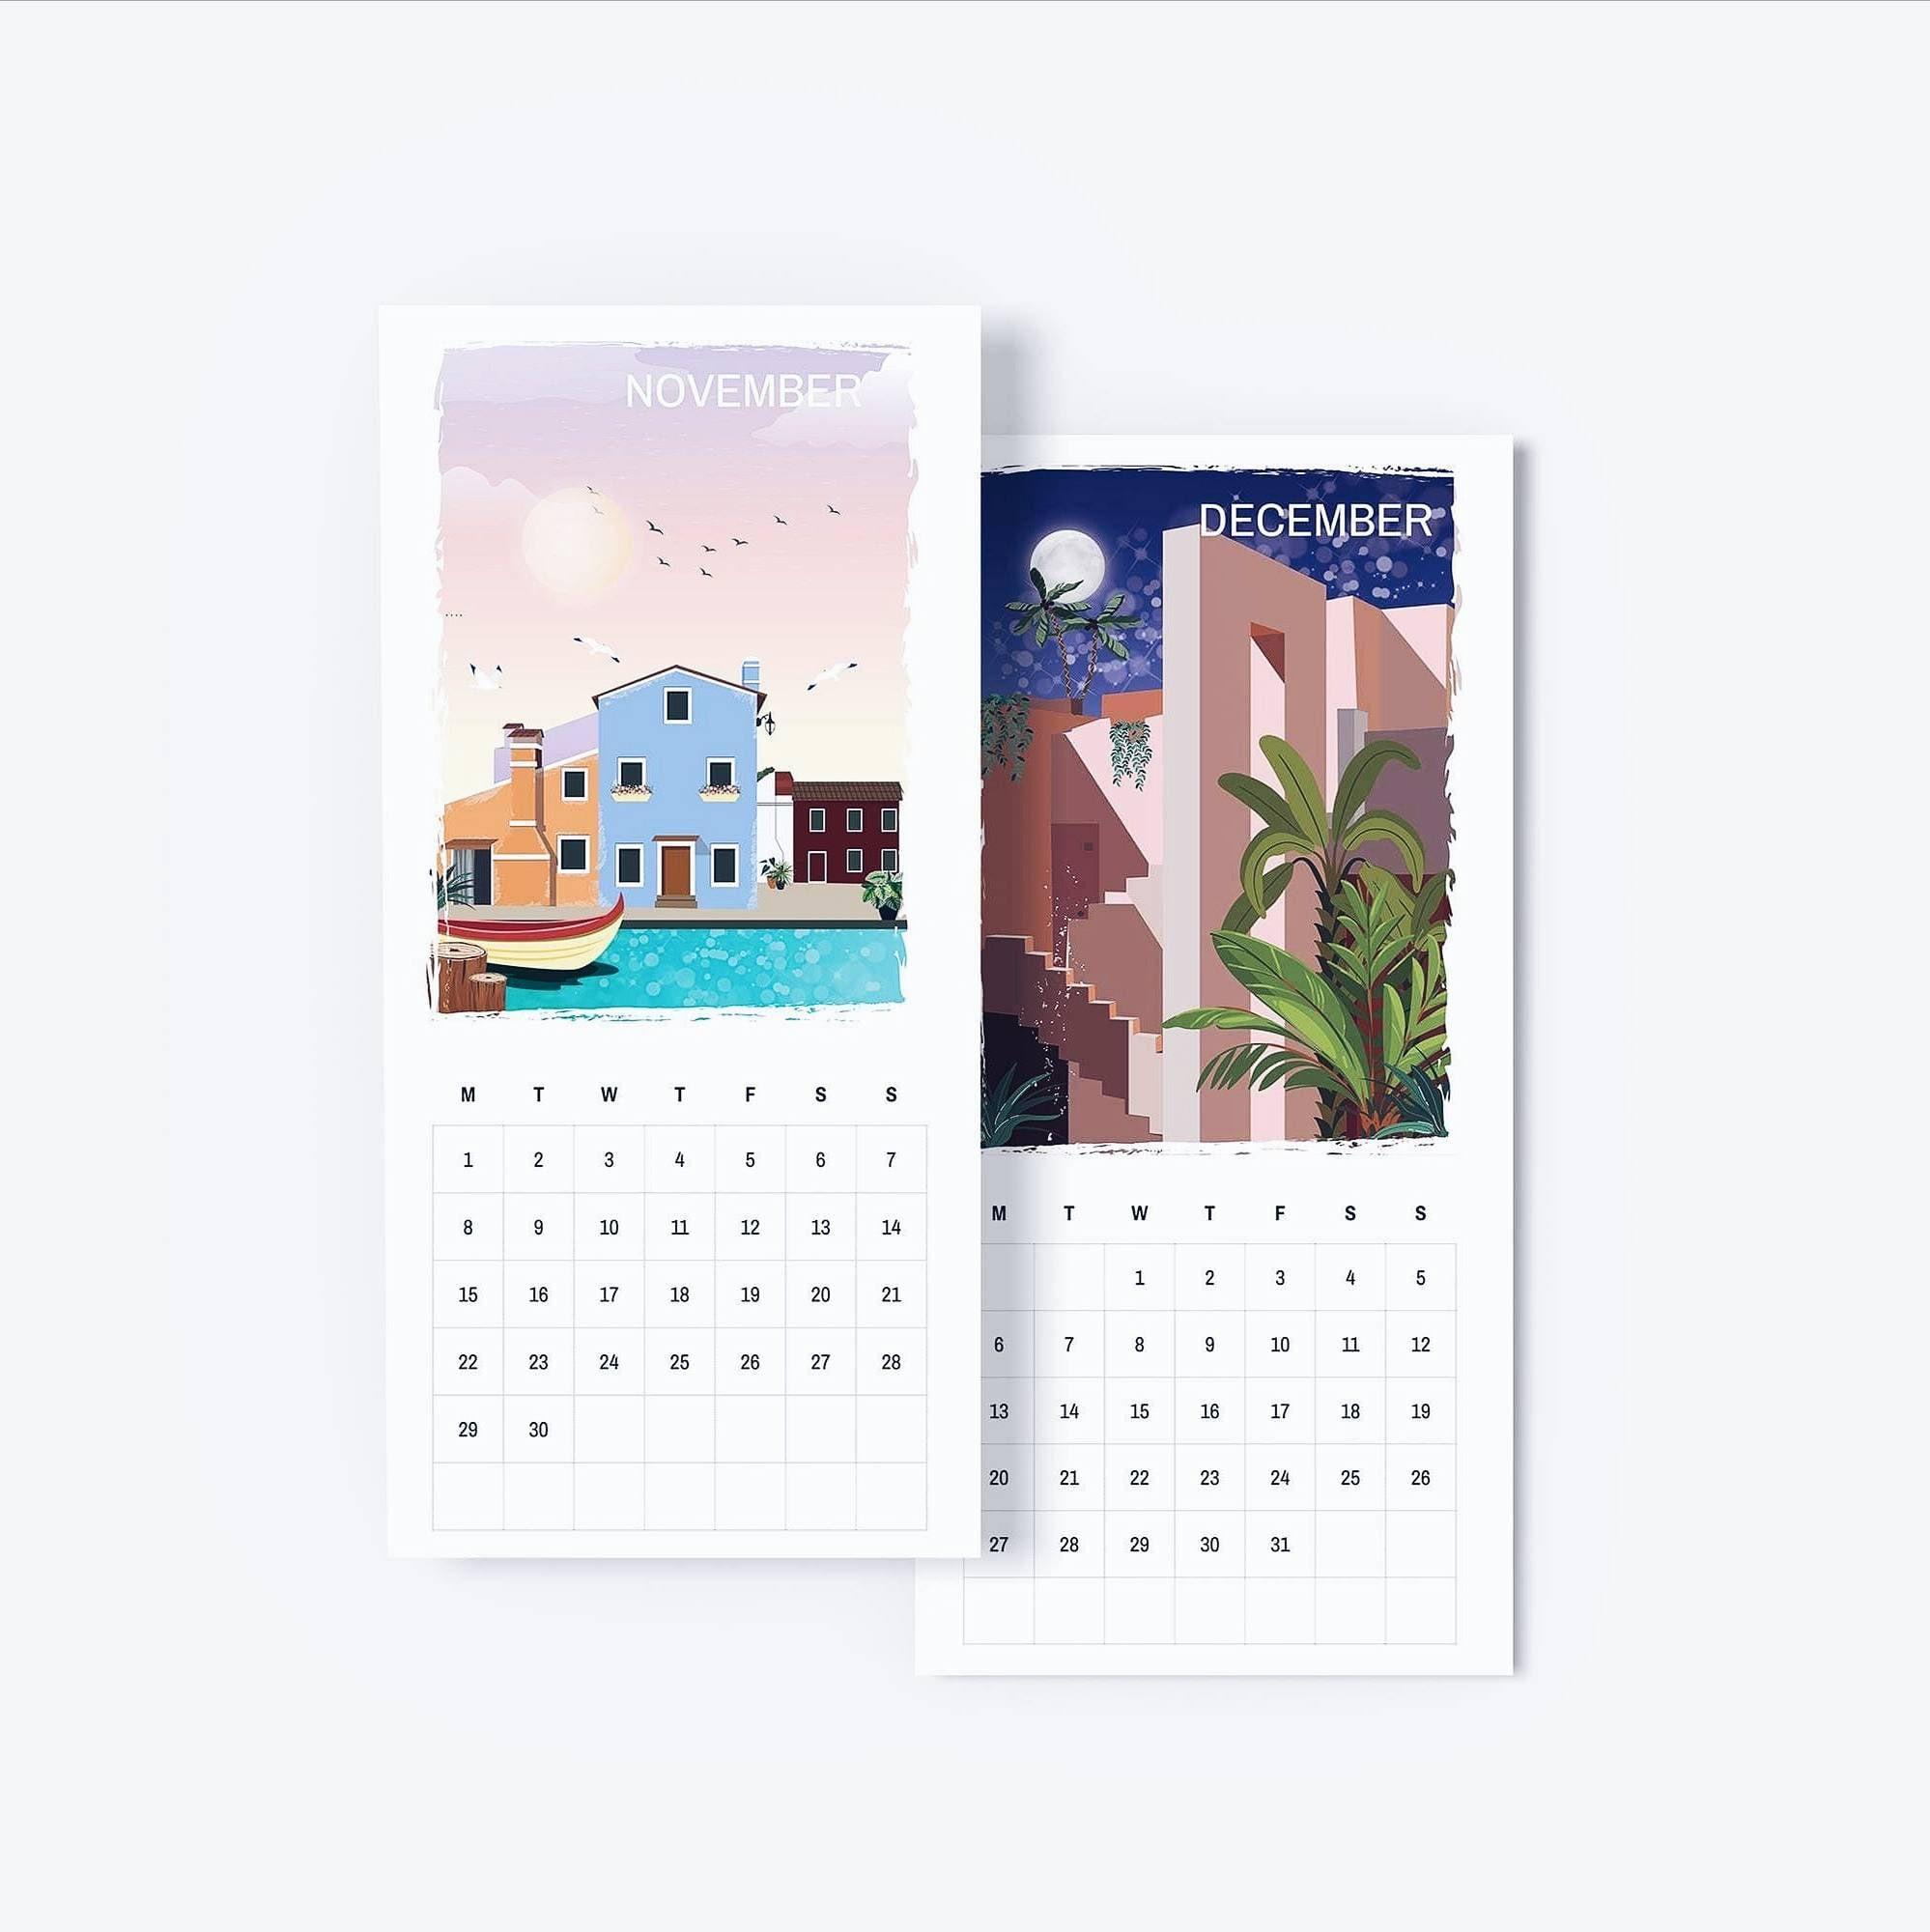 Calendar 2021, Travel, Poster, Poster, Illustration, Print-2021 Calendar For Vacation